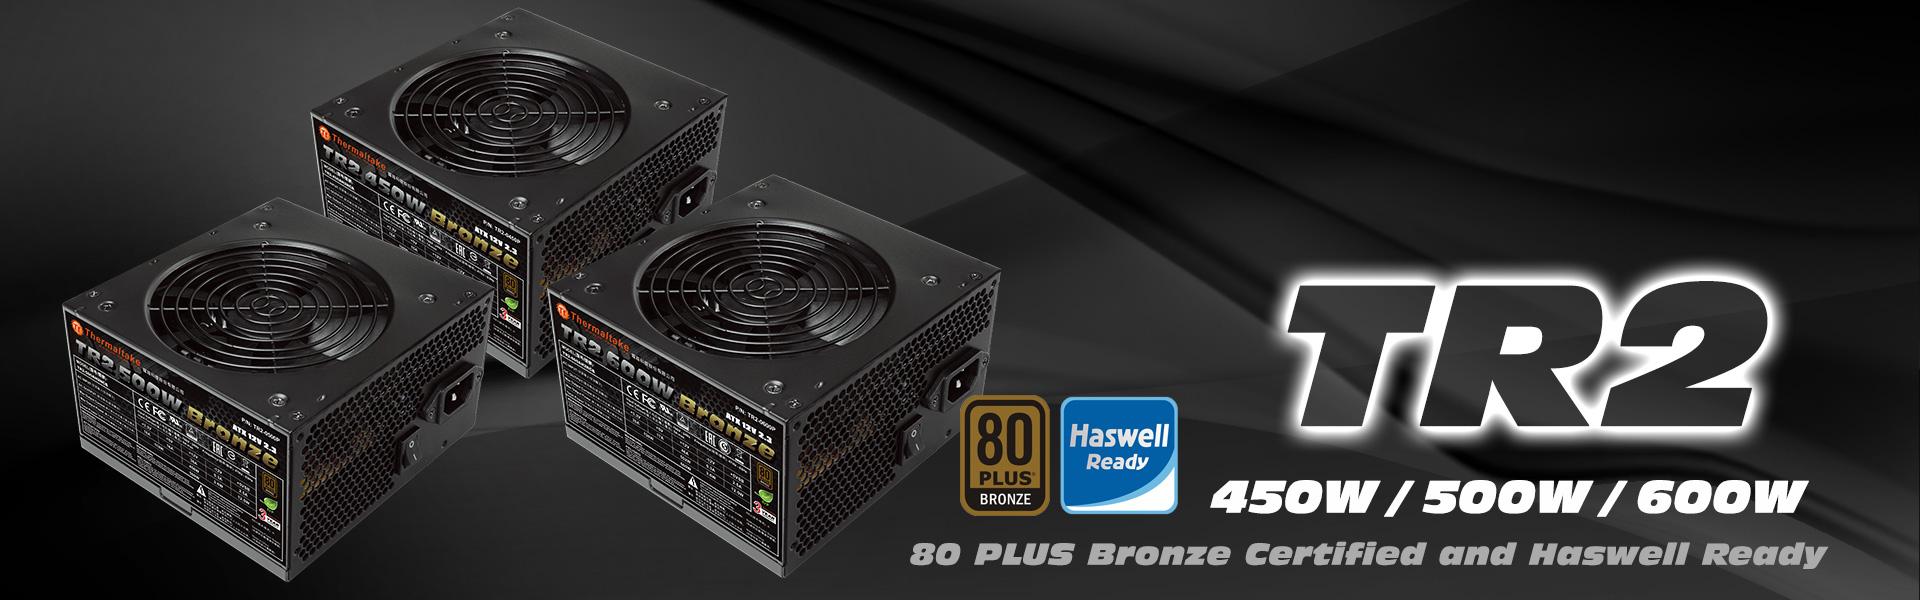 Thermaltake New TR2 Bronze Series Power Supply Units